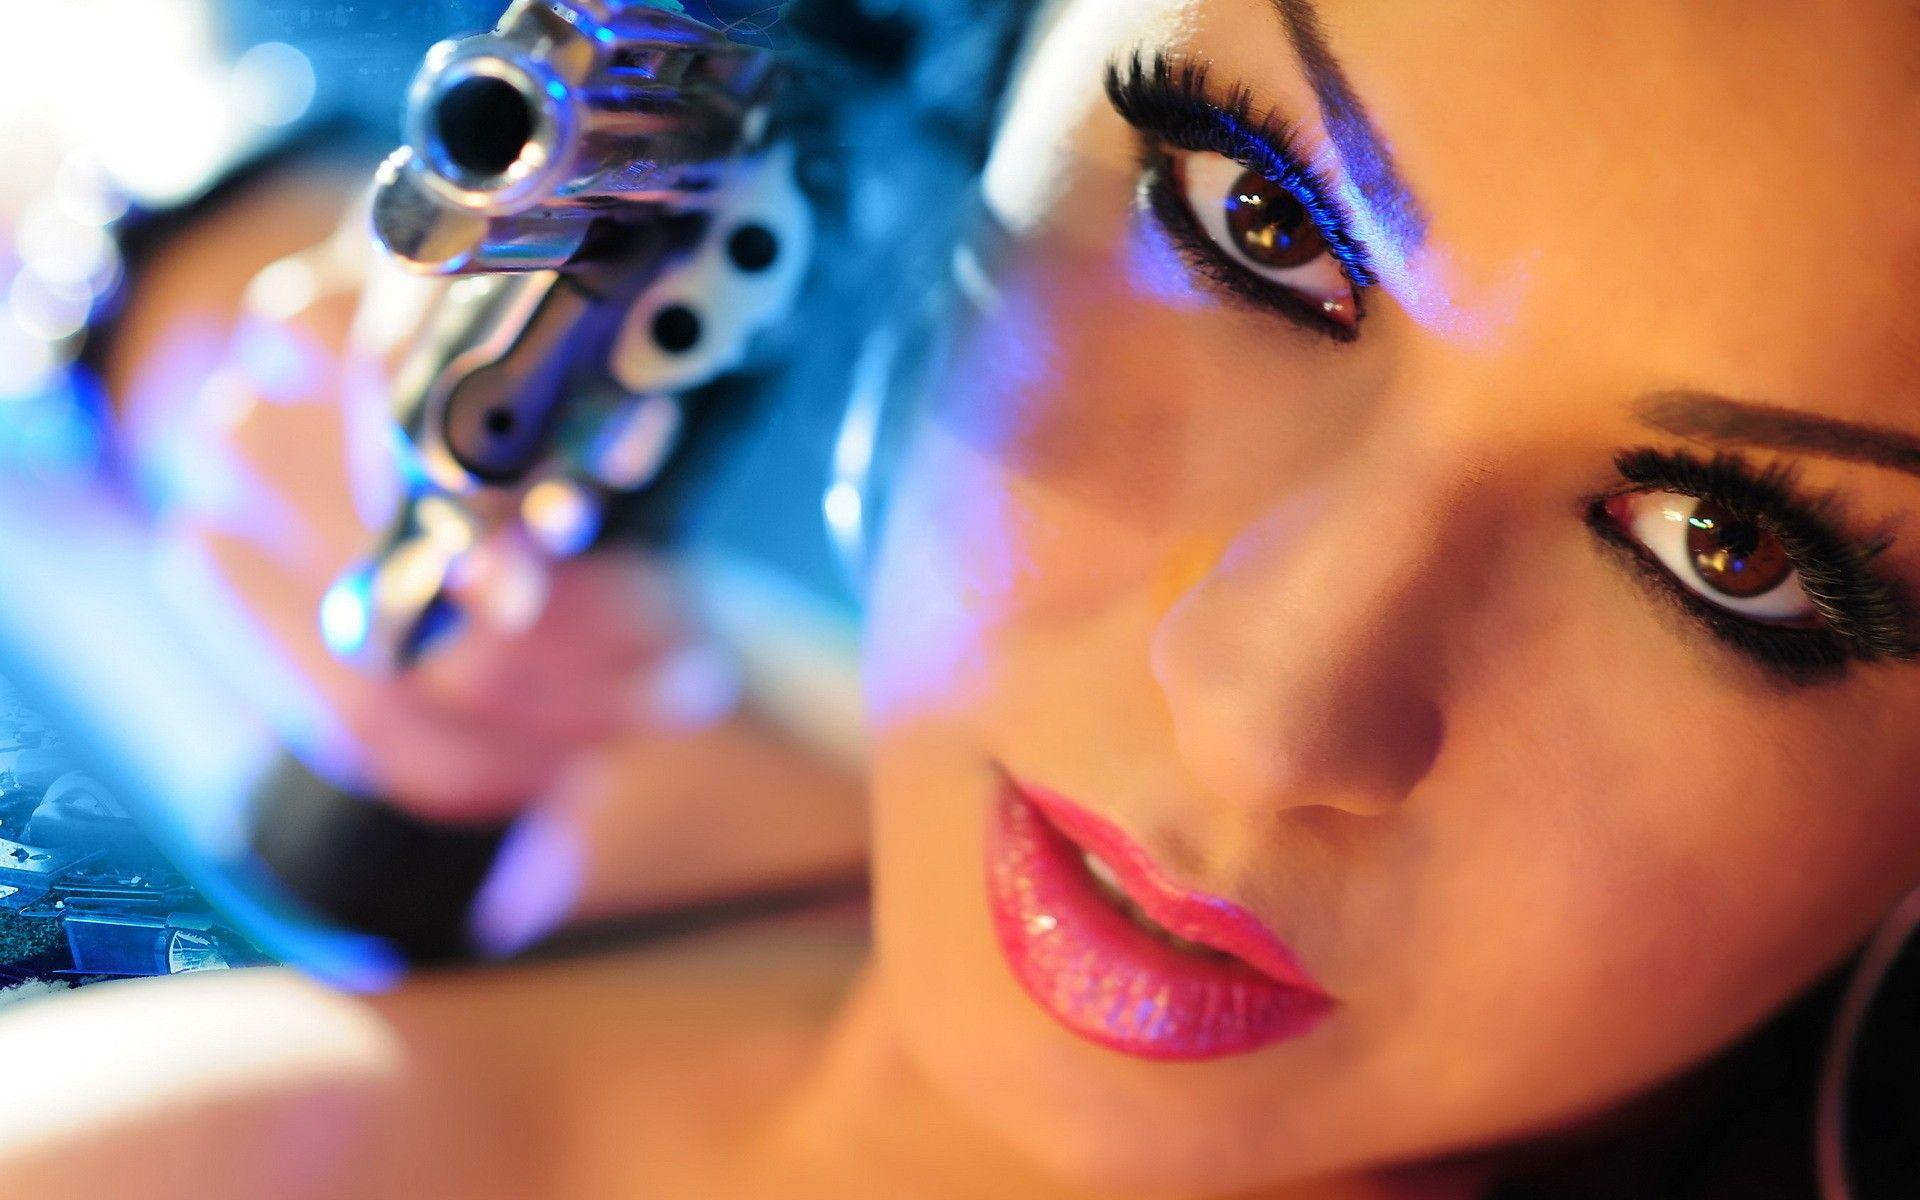 Pin On Girl With Gun